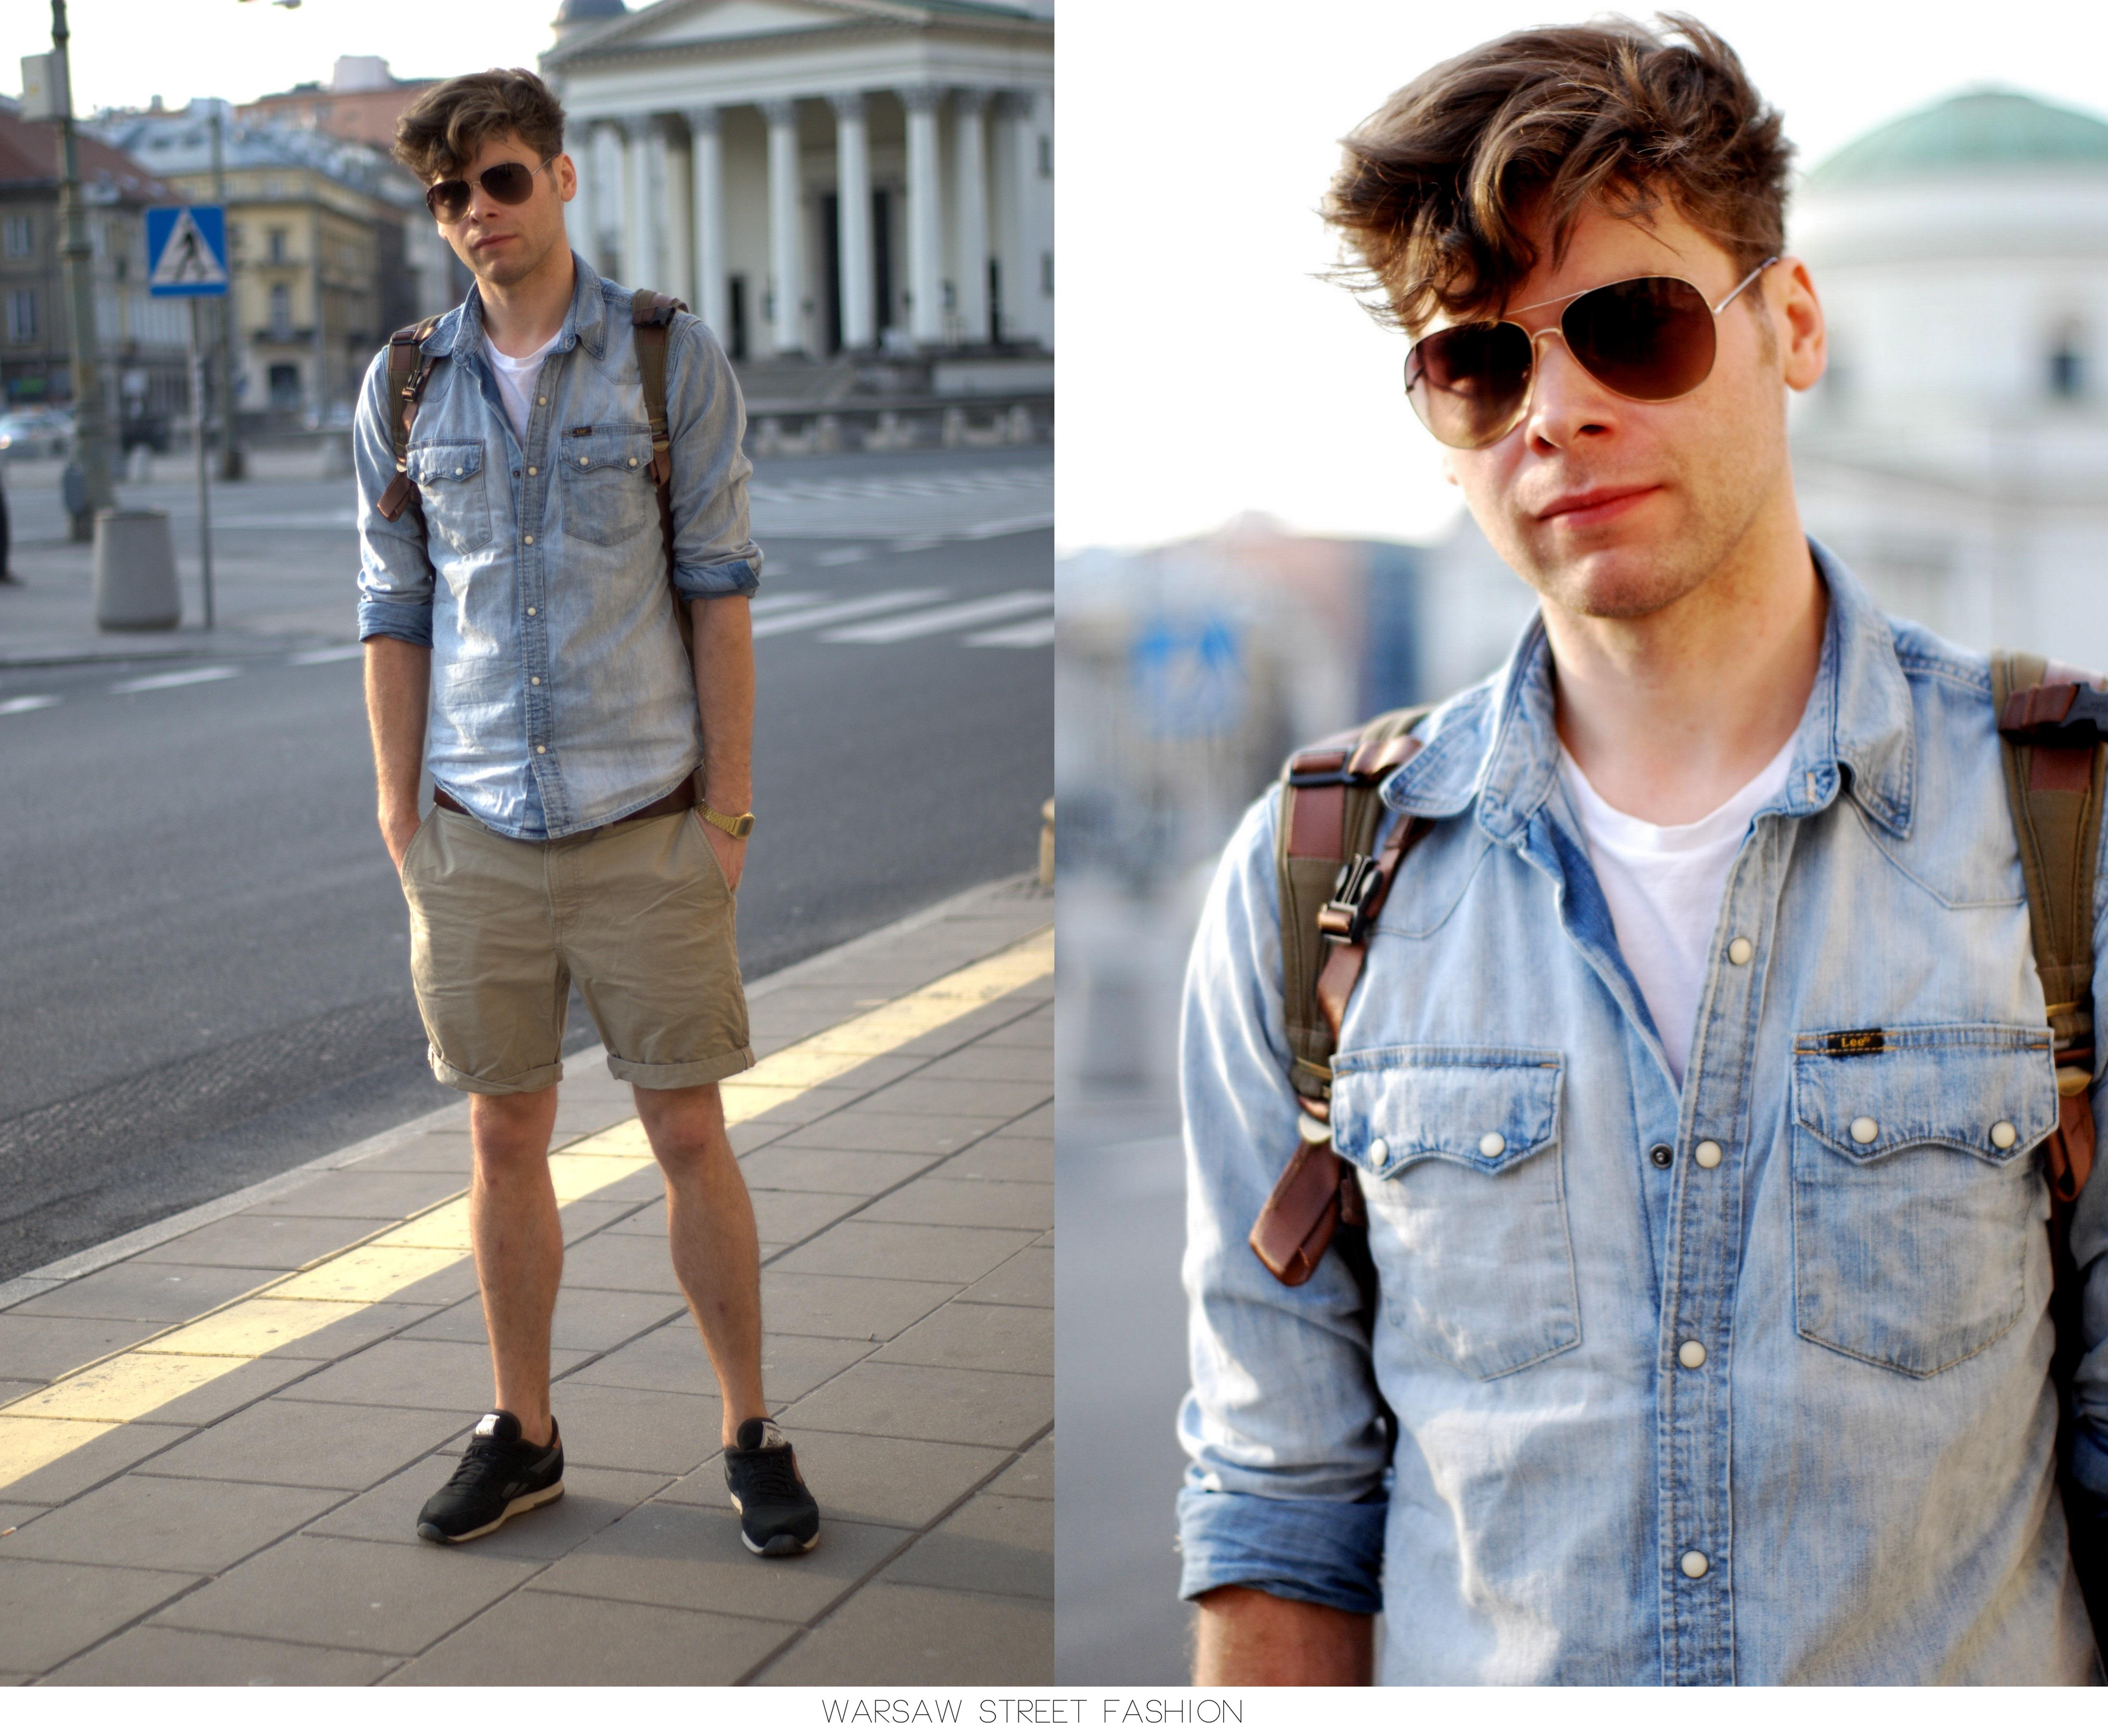 warsawstreetfashion #warsaw #street #fashion #polish #stylish #guy ...